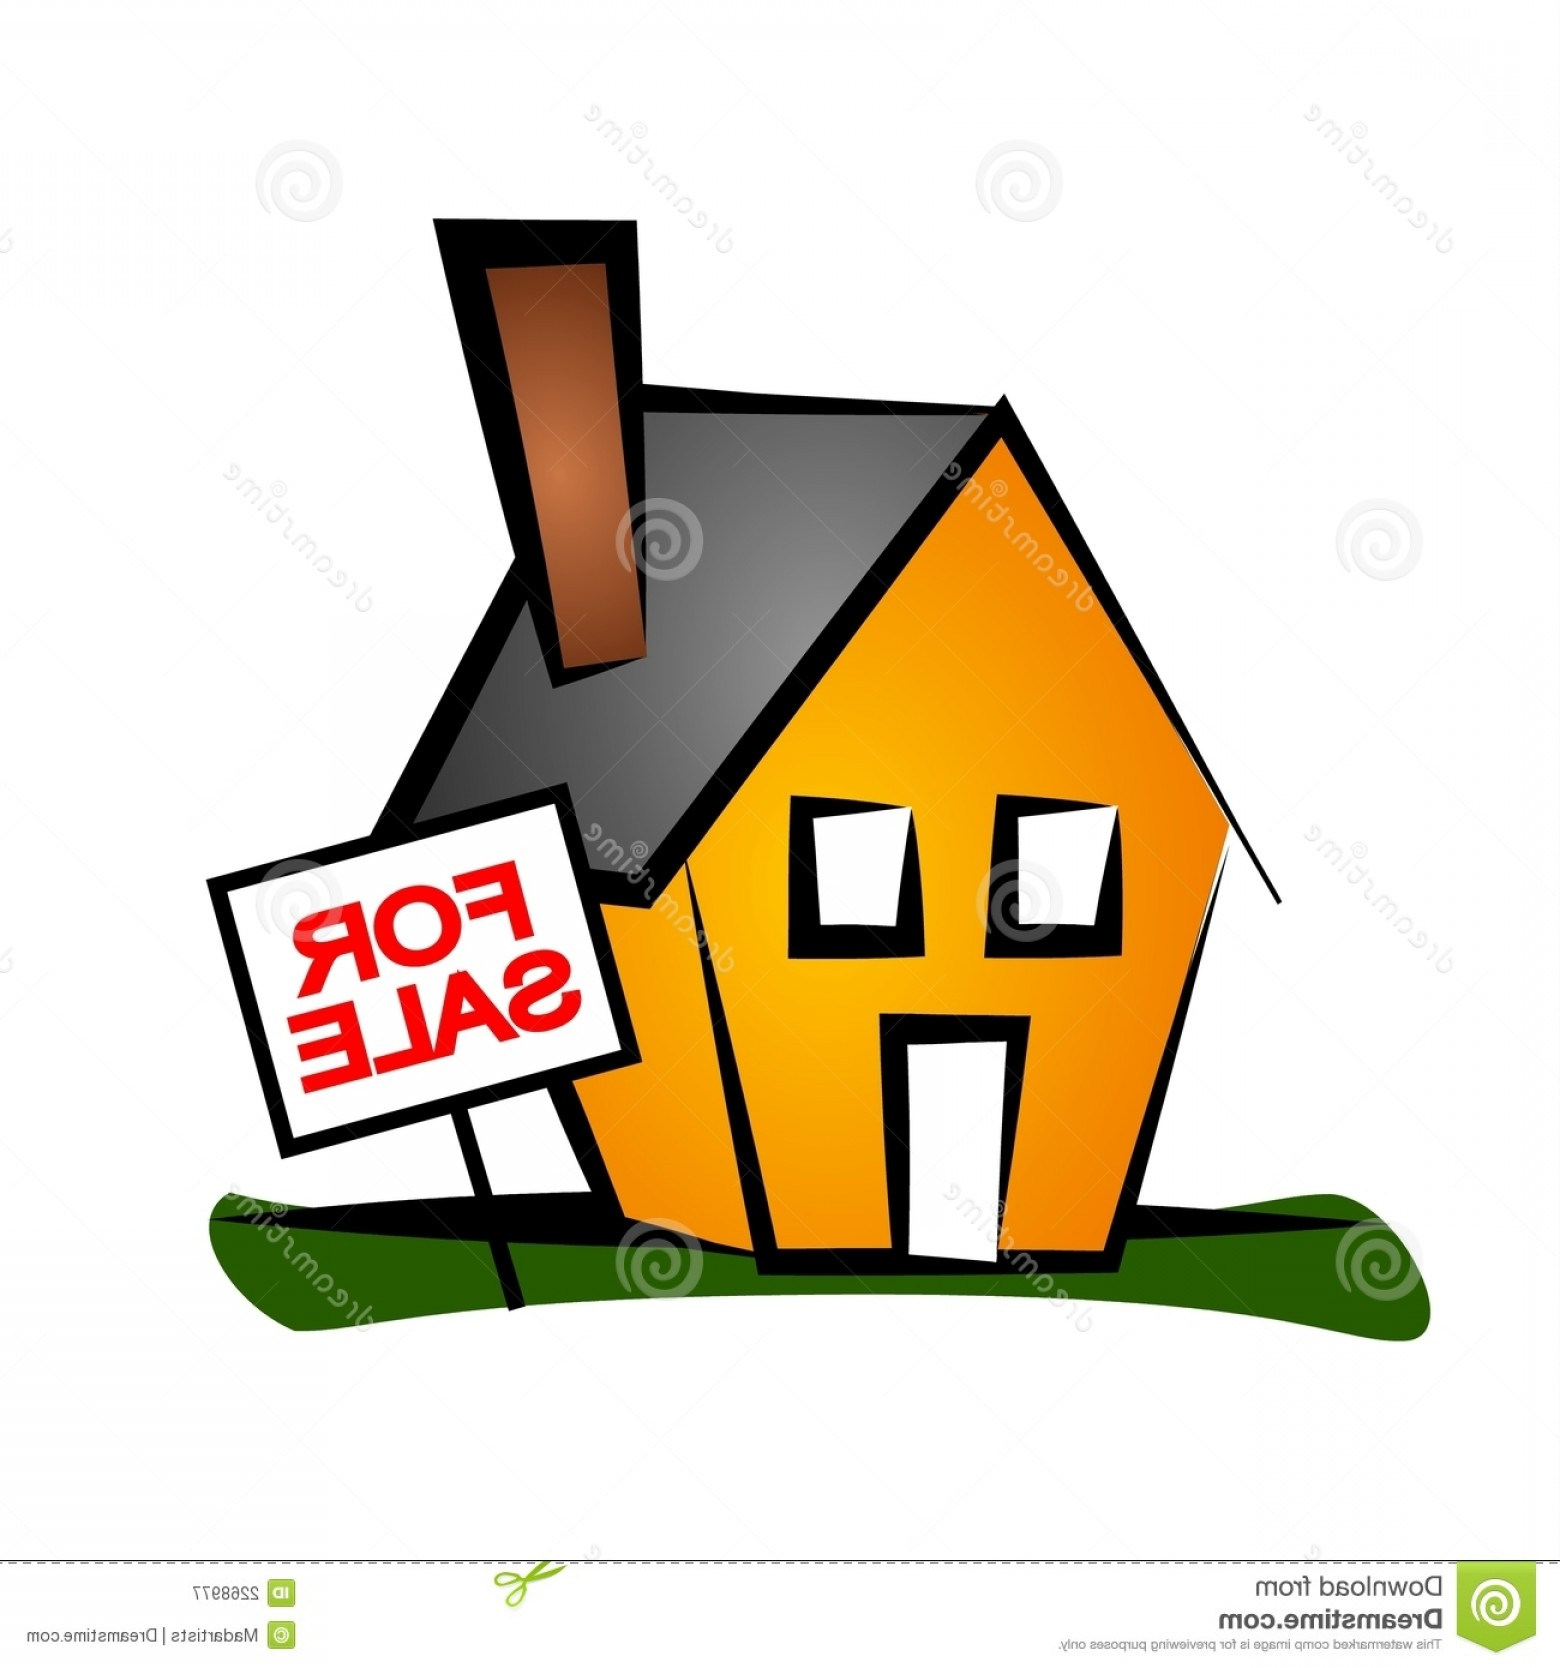 1560x1668 Yard Sale House Silhouette Vector Lazttweet